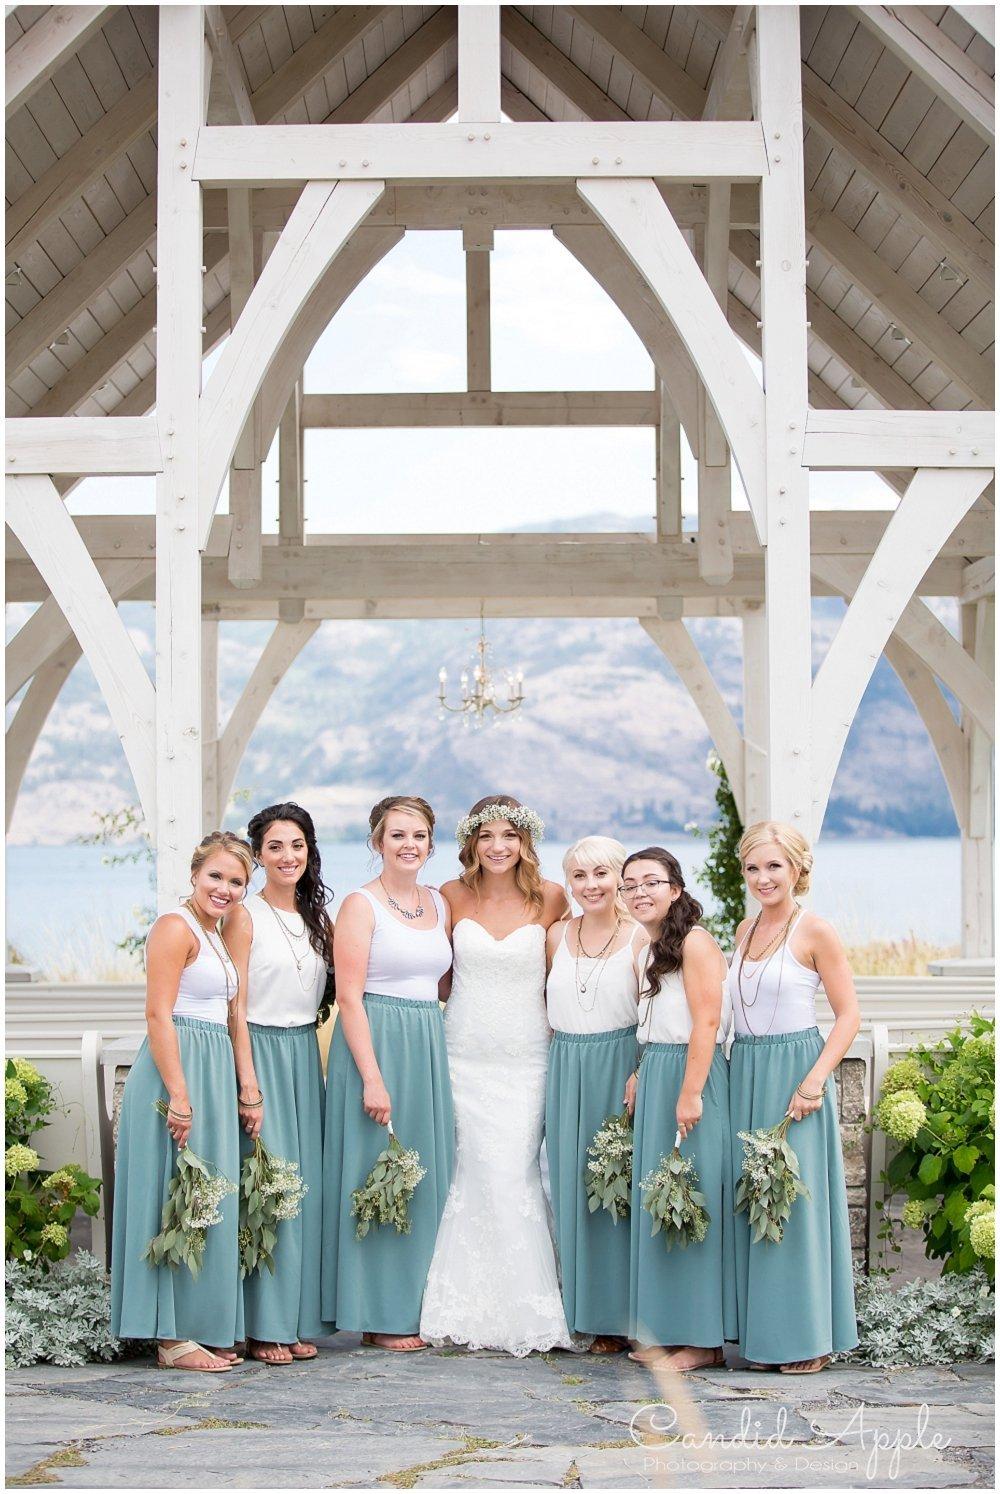 Sanctuary_Garden_West_Kelowna_Candid_Apple_Wedding_Photography_0056